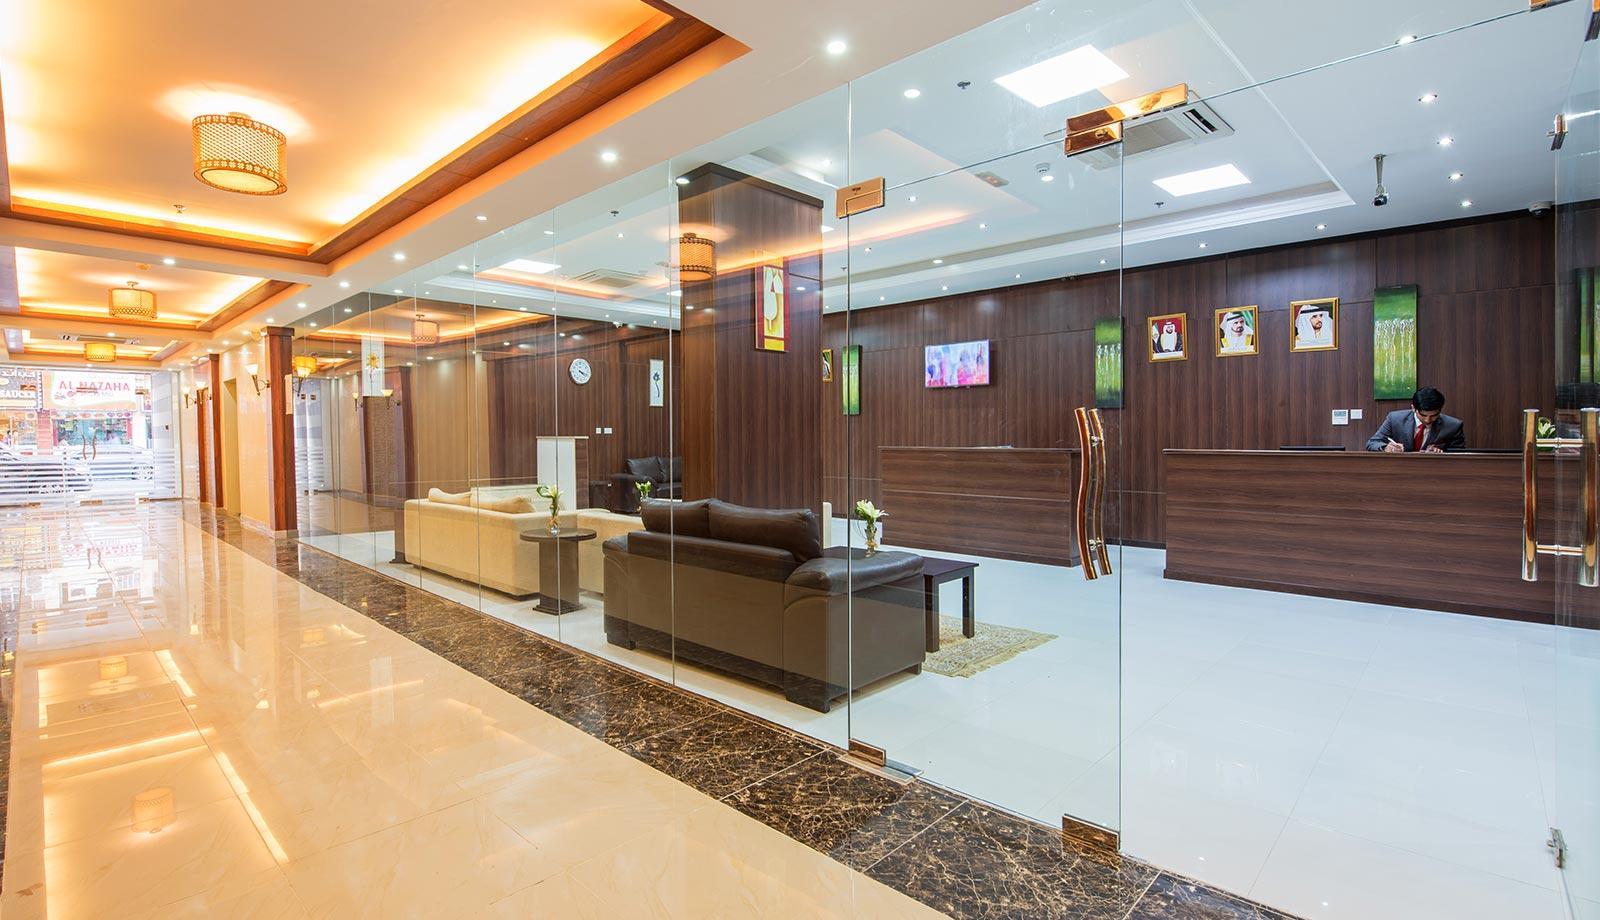 Al Farej Hotel 3*